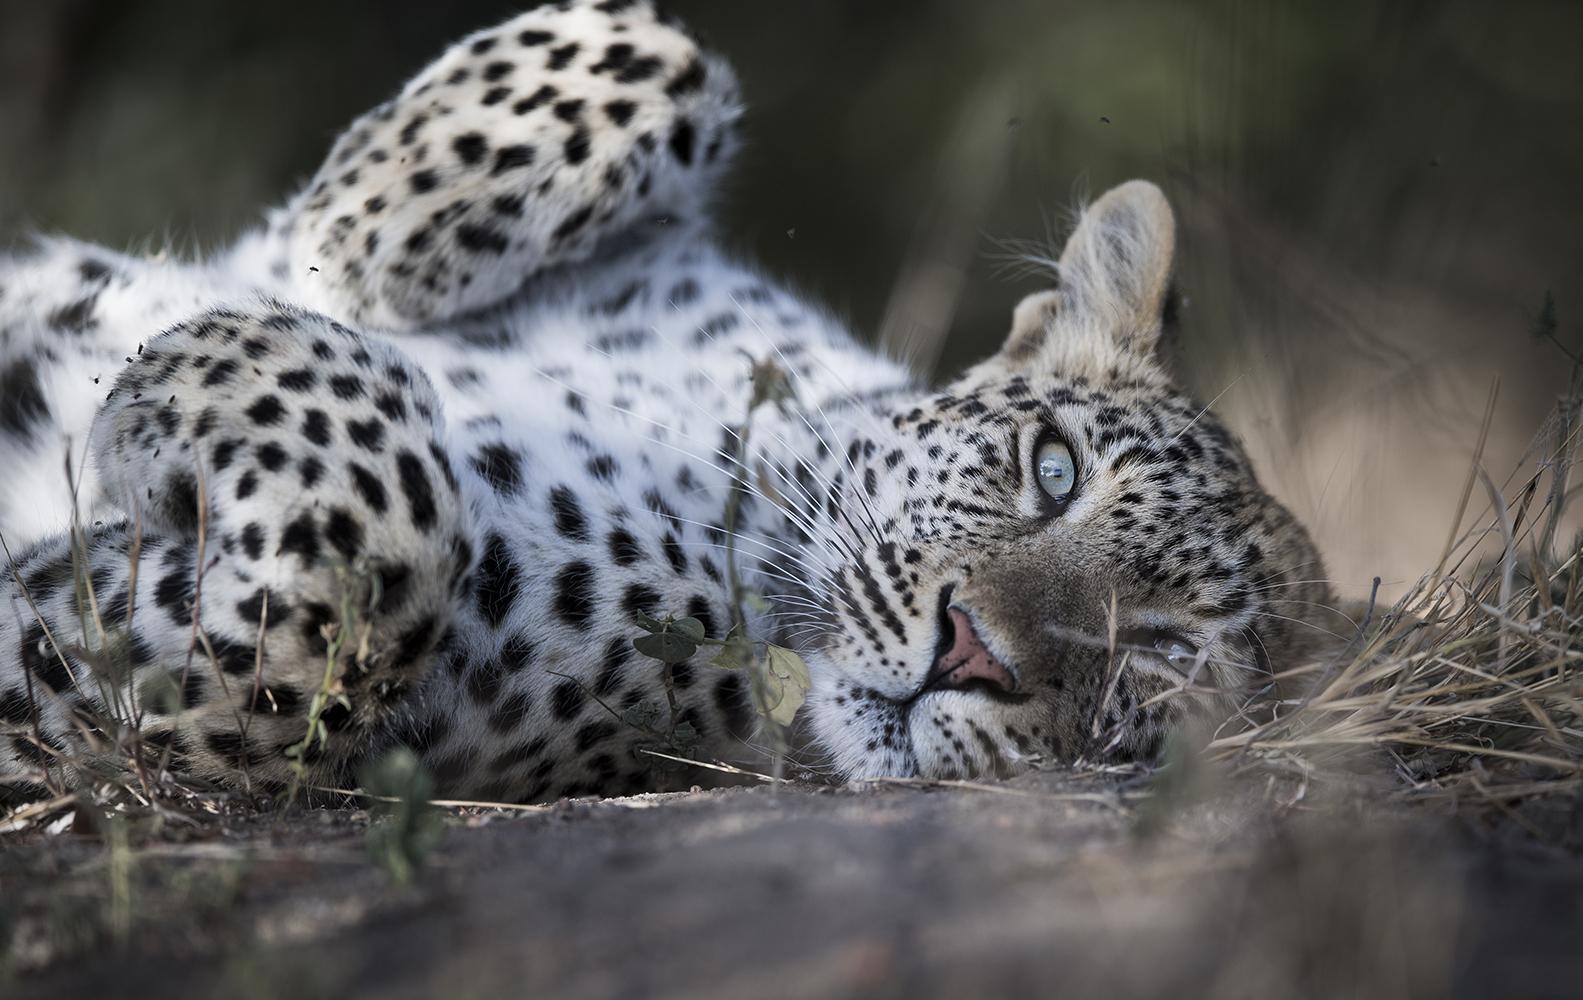 trai anfield photography Safaris Umlani